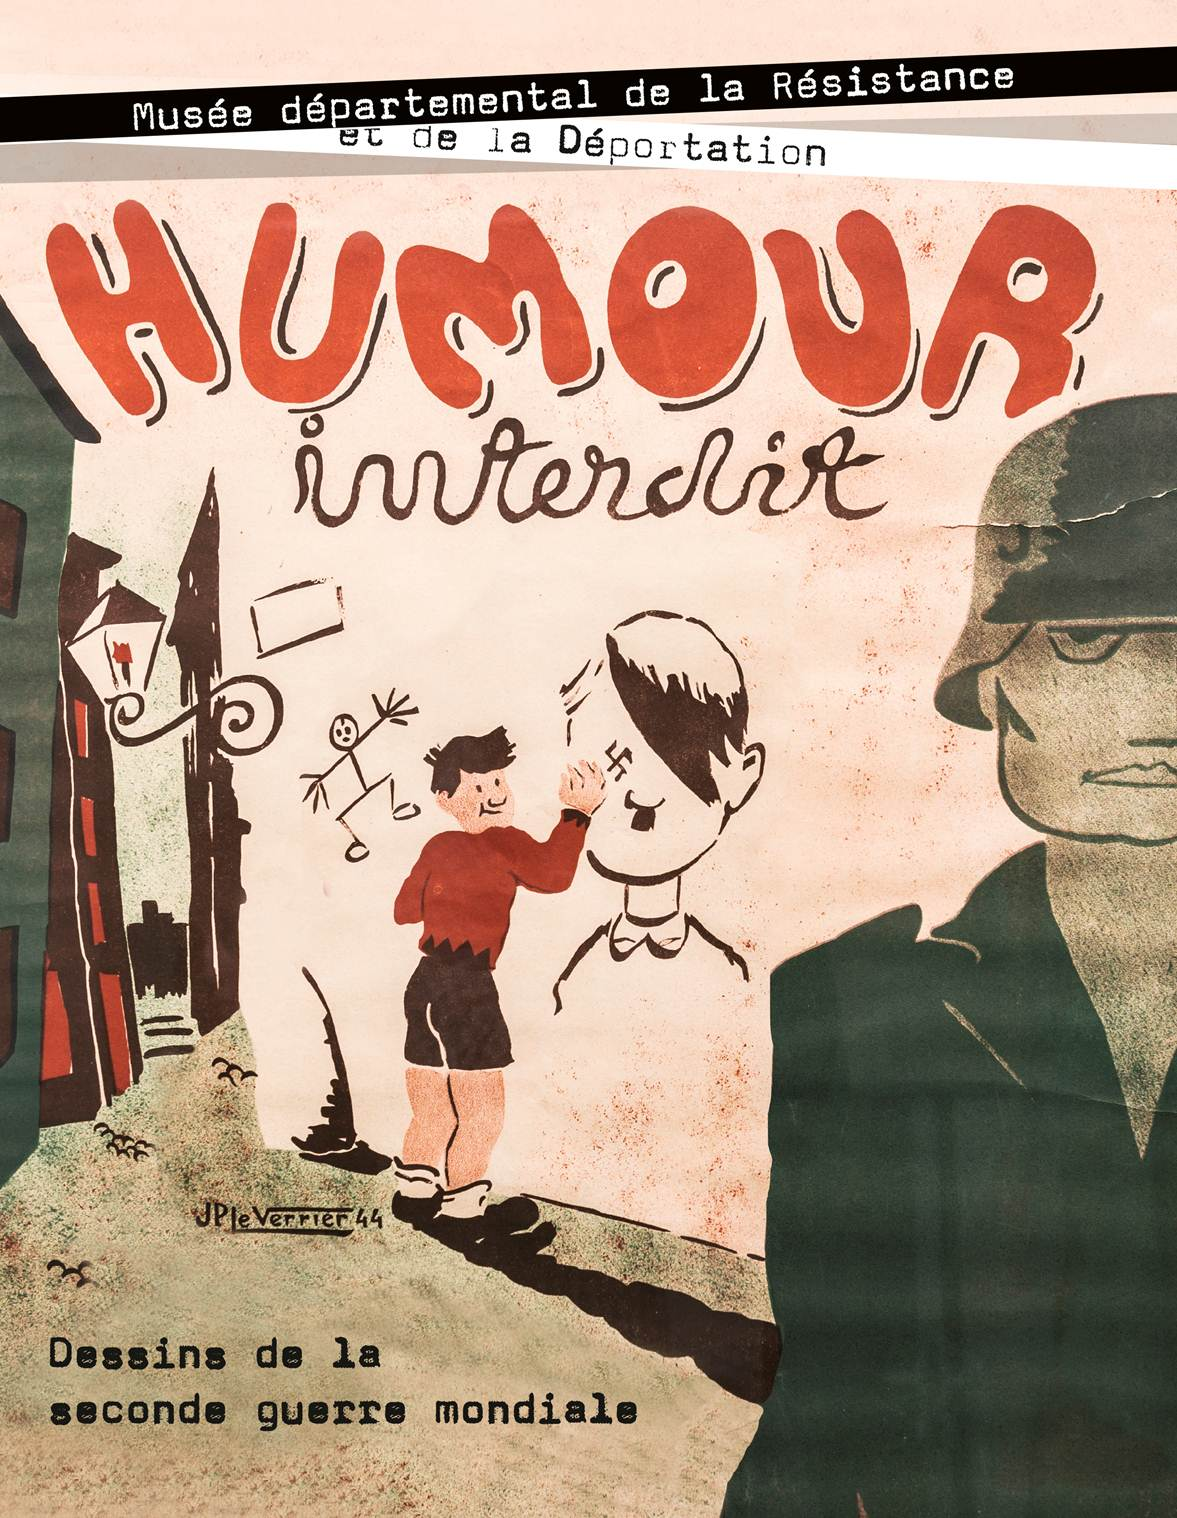 notice bibliographique humour interdit dessins de la seconde guerre mondiale exposition 20. Black Bedroom Furniture Sets. Home Design Ideas